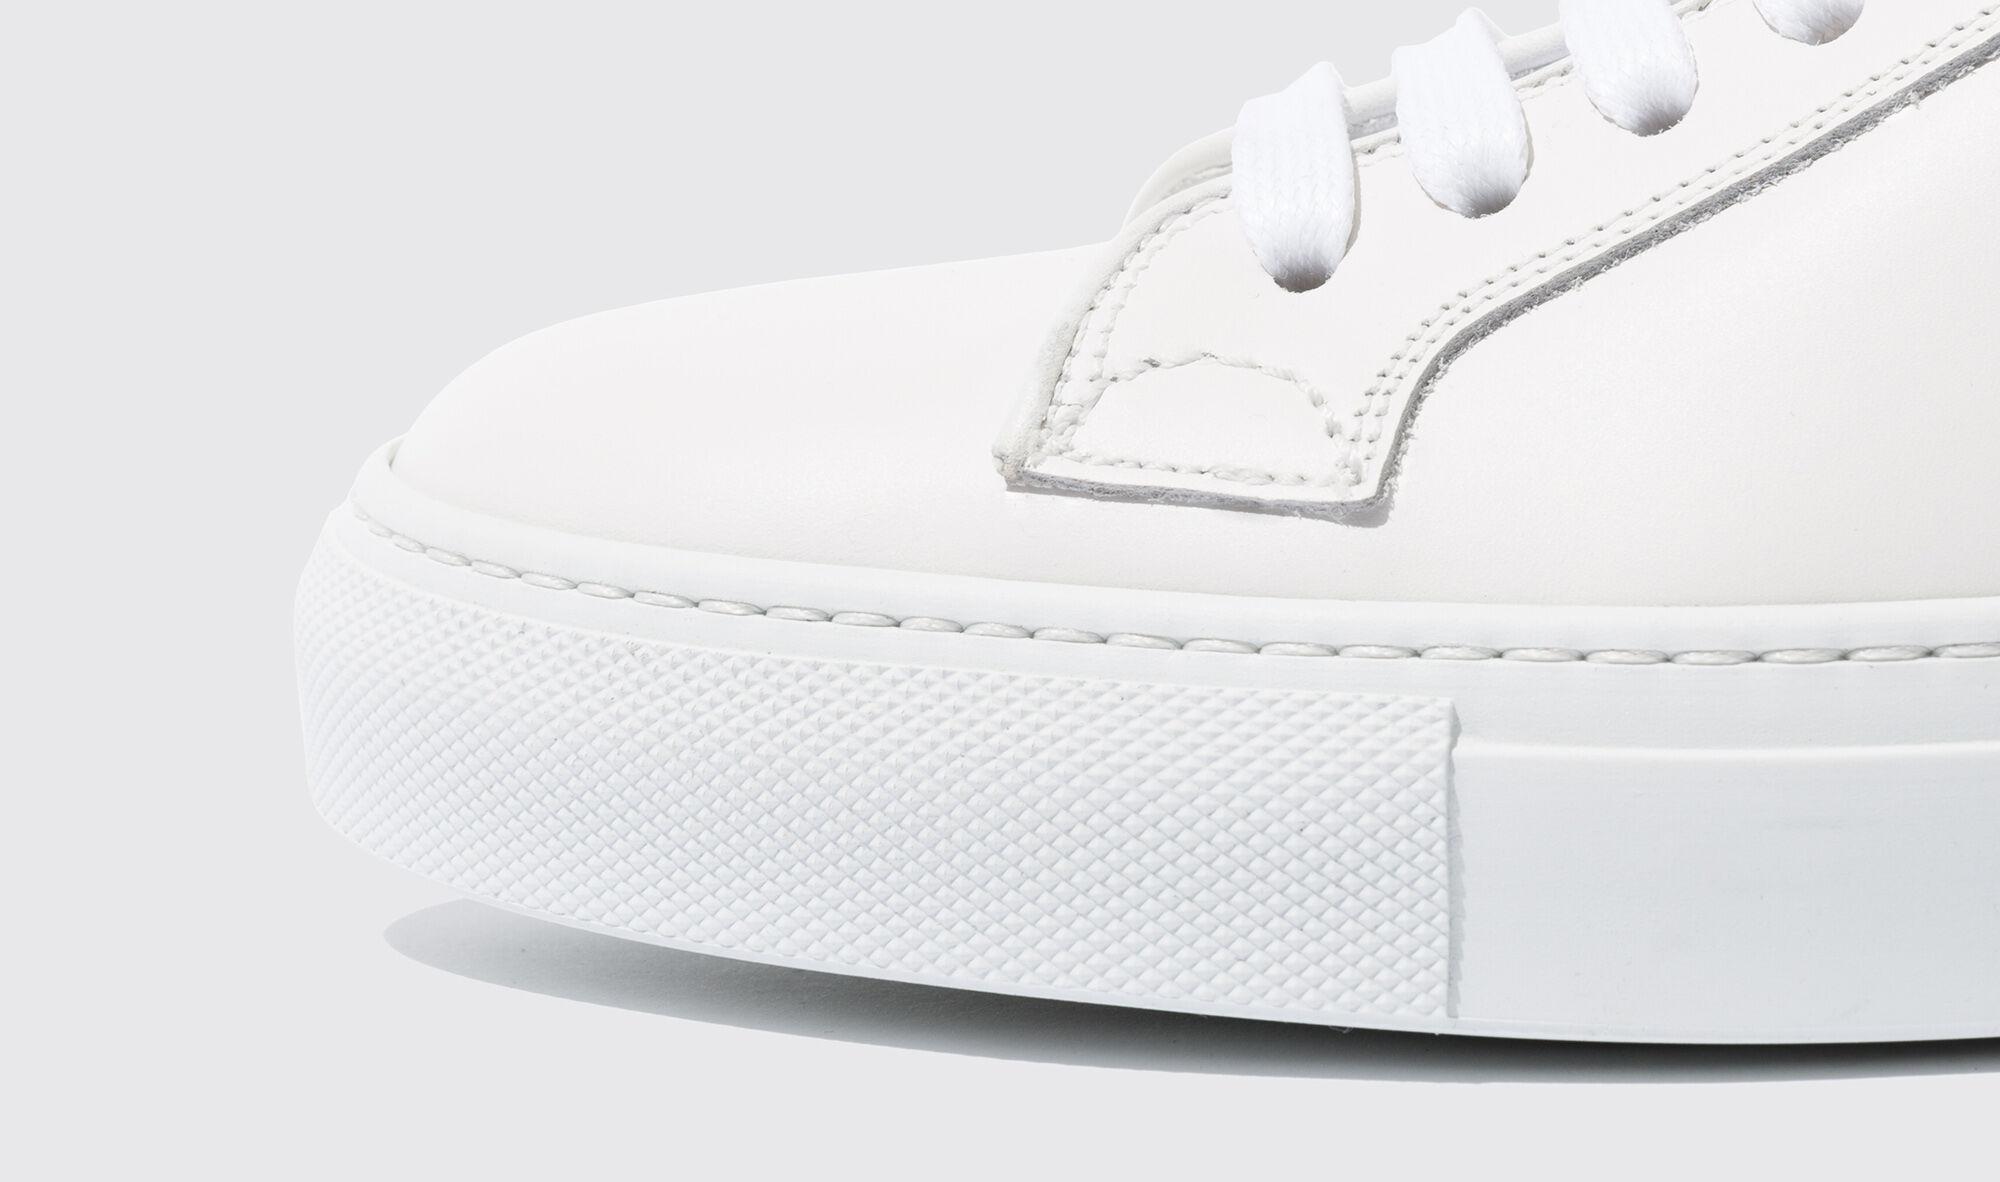 Herren Sneakers Handgefertigte Schuhe   Scarosso Ugo Bianco